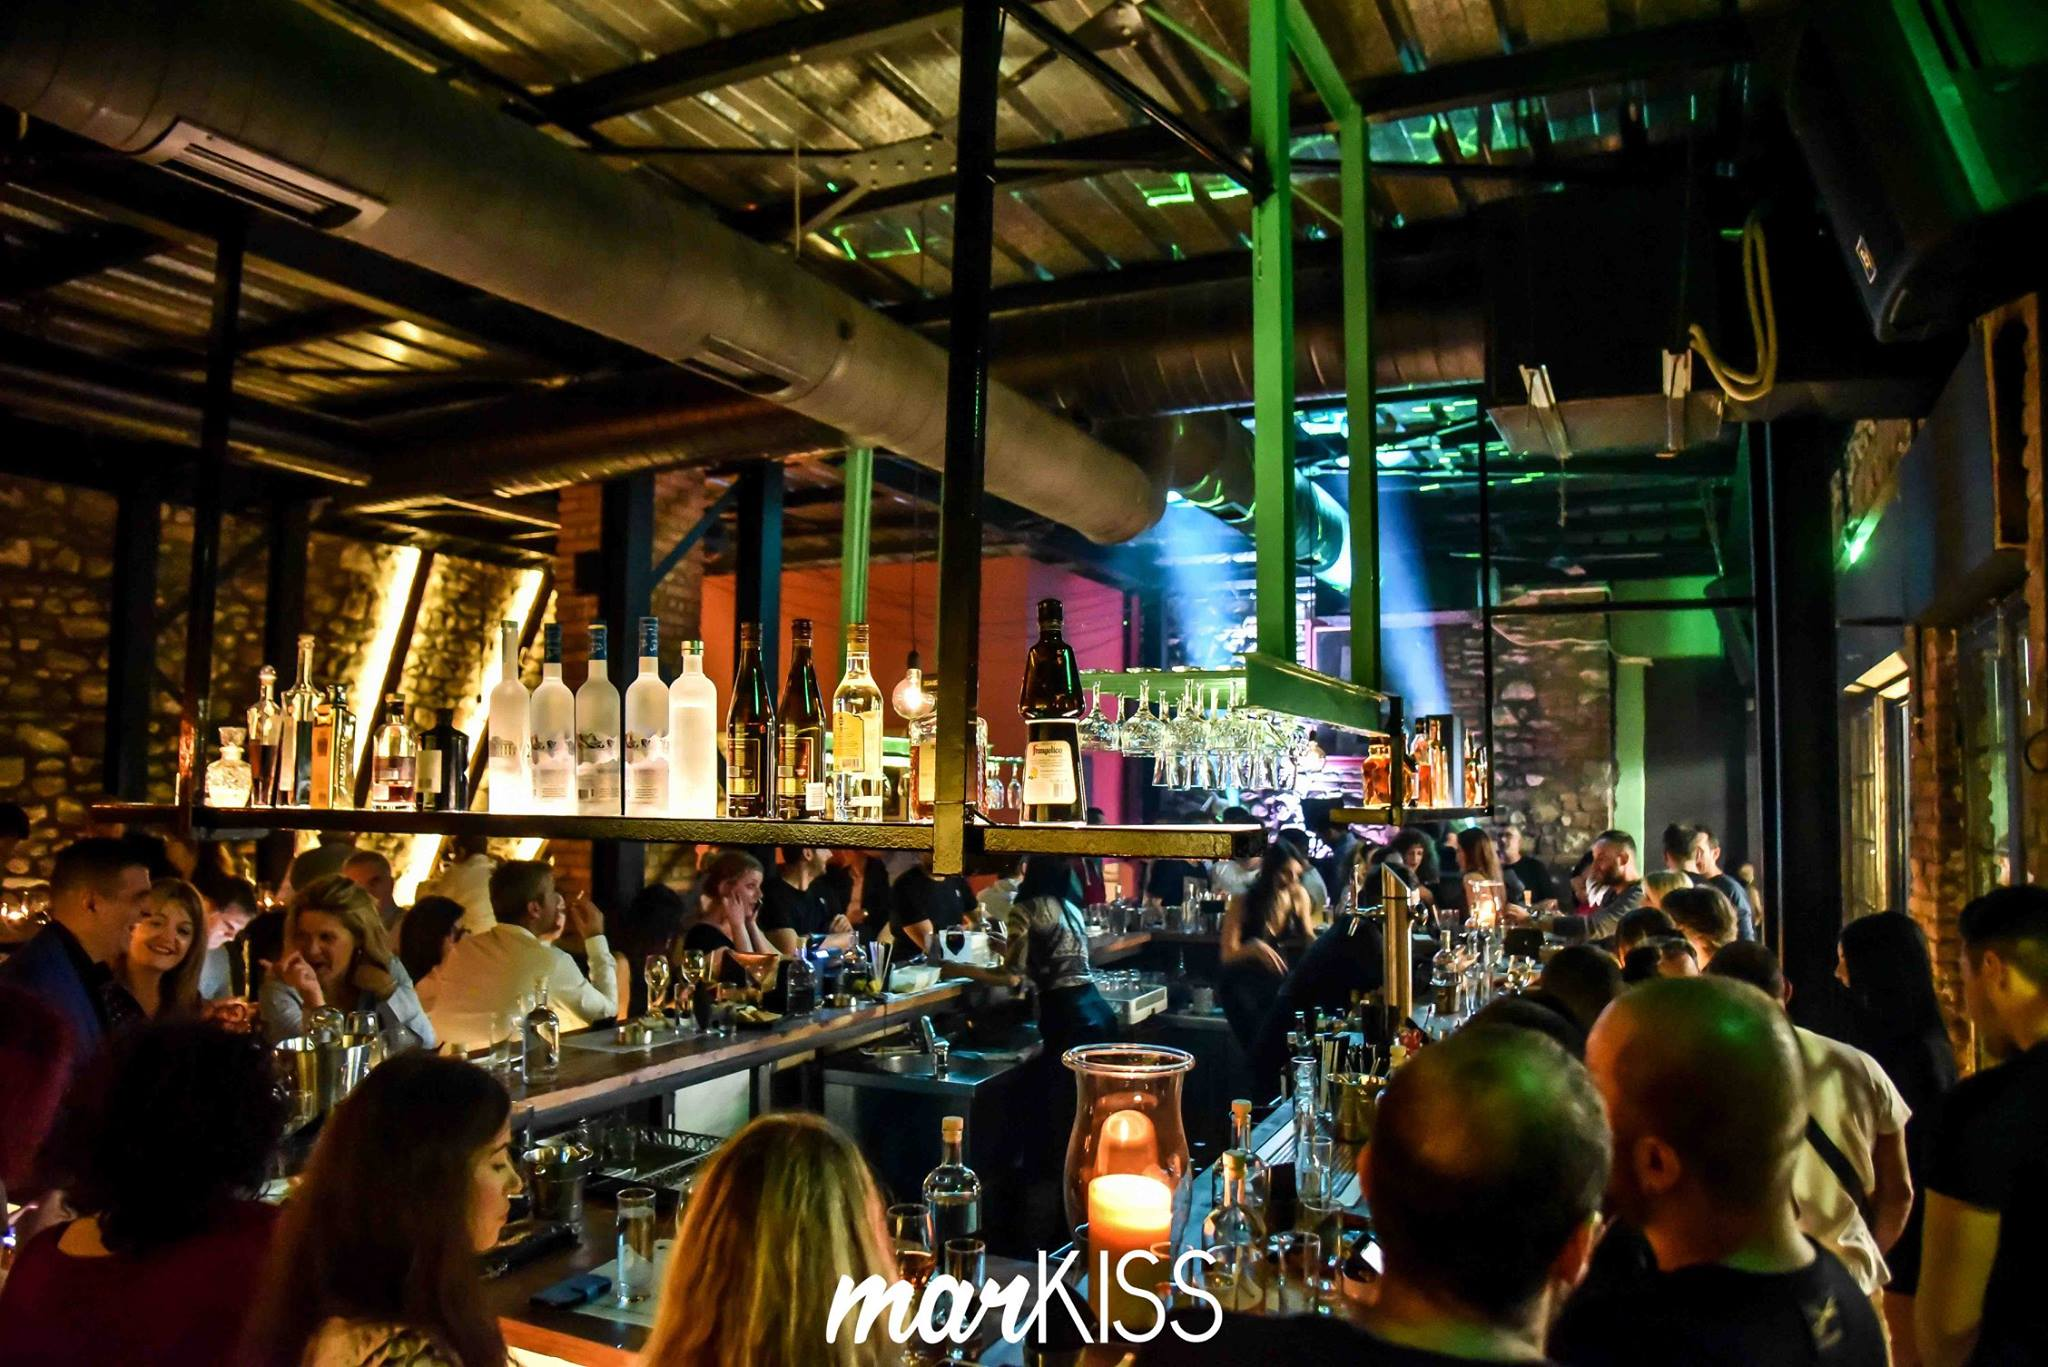 mar2 - Ότι καλύτερο είδαμε στο opening του marKISS! (Παρασκευή 20 Οκτωβρίου)